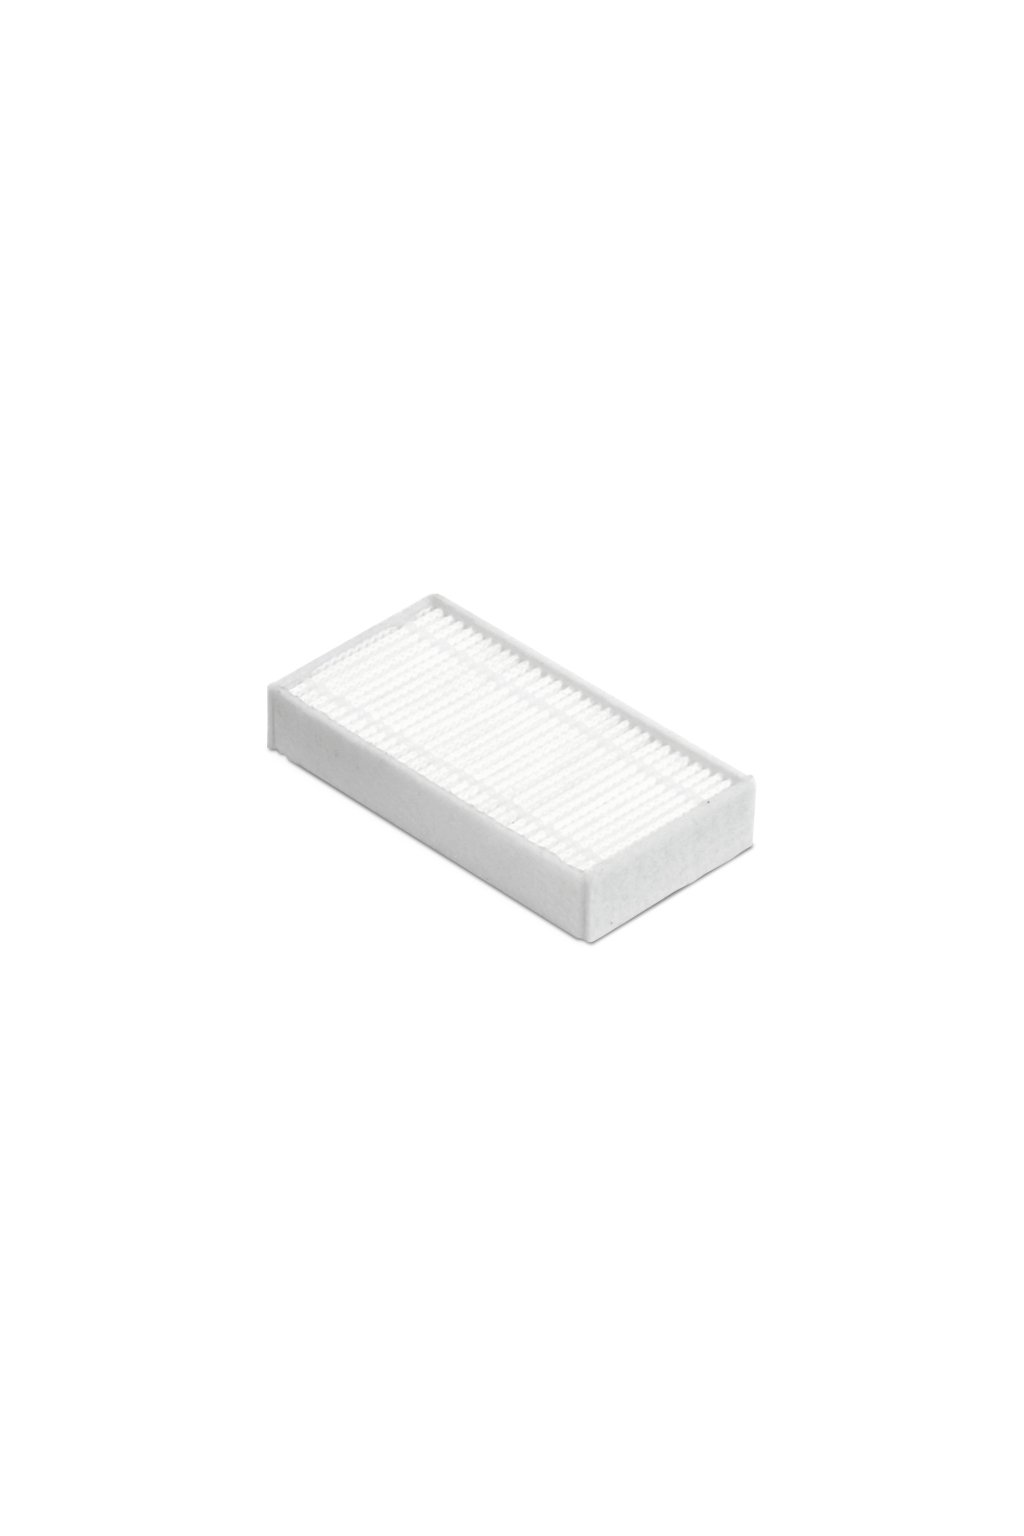 Duoro XCONTROL hepa szűrő